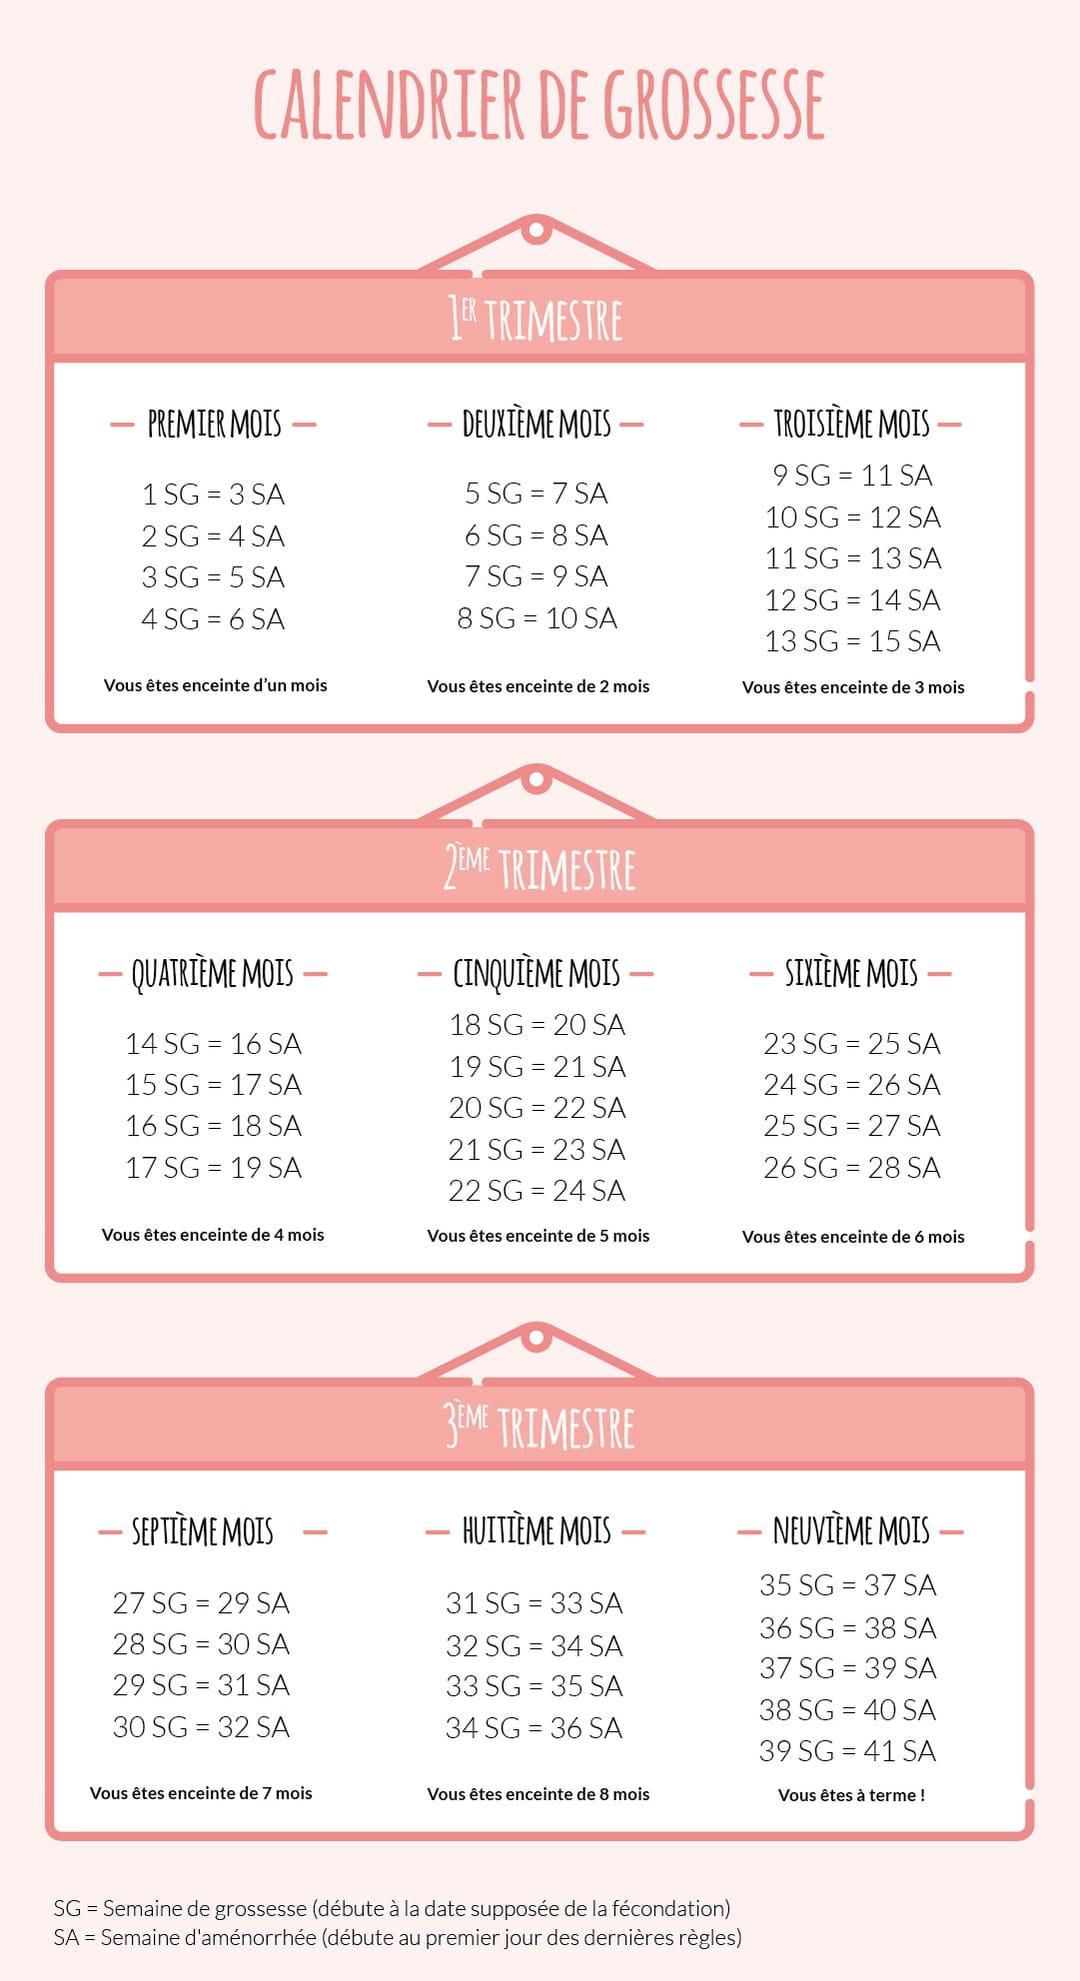 calendrier-de-grossesse-semaines-amenorrhee